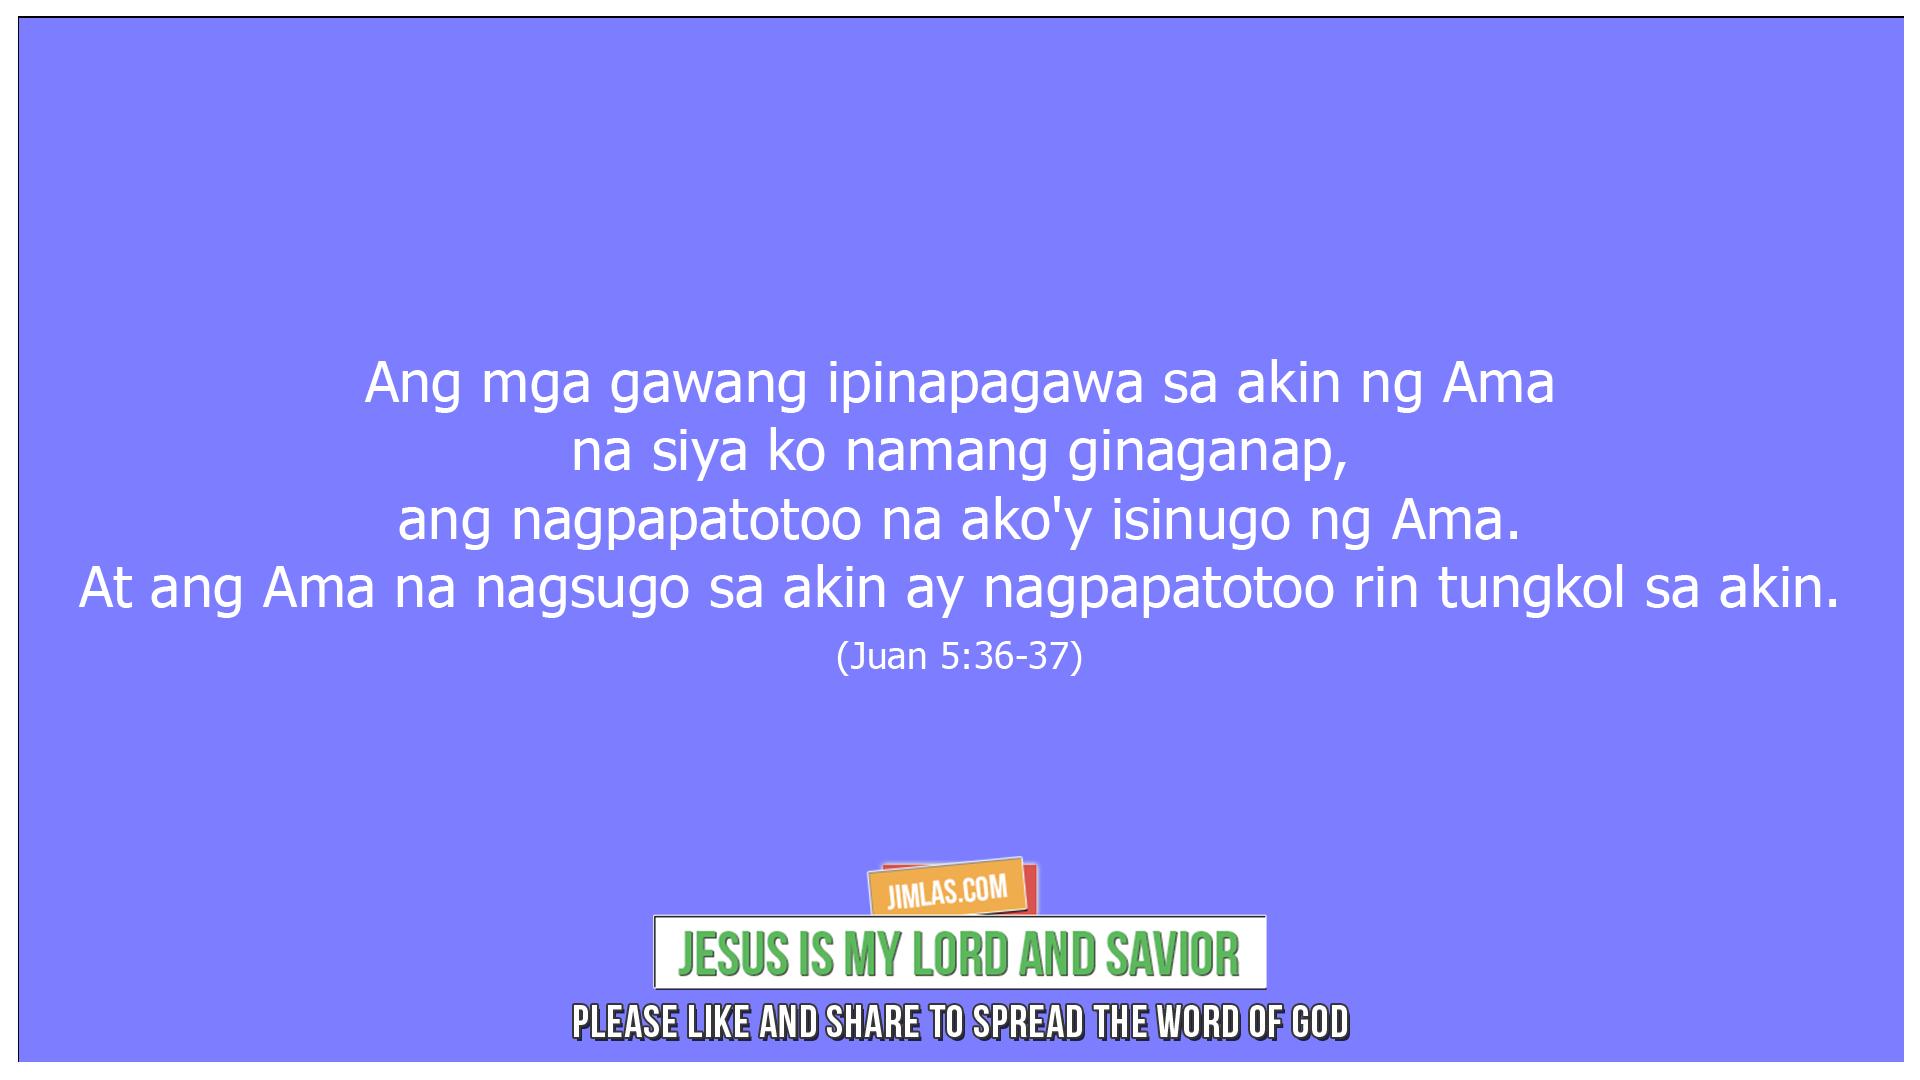 Juan 5 36-37, Juan 5:36-37